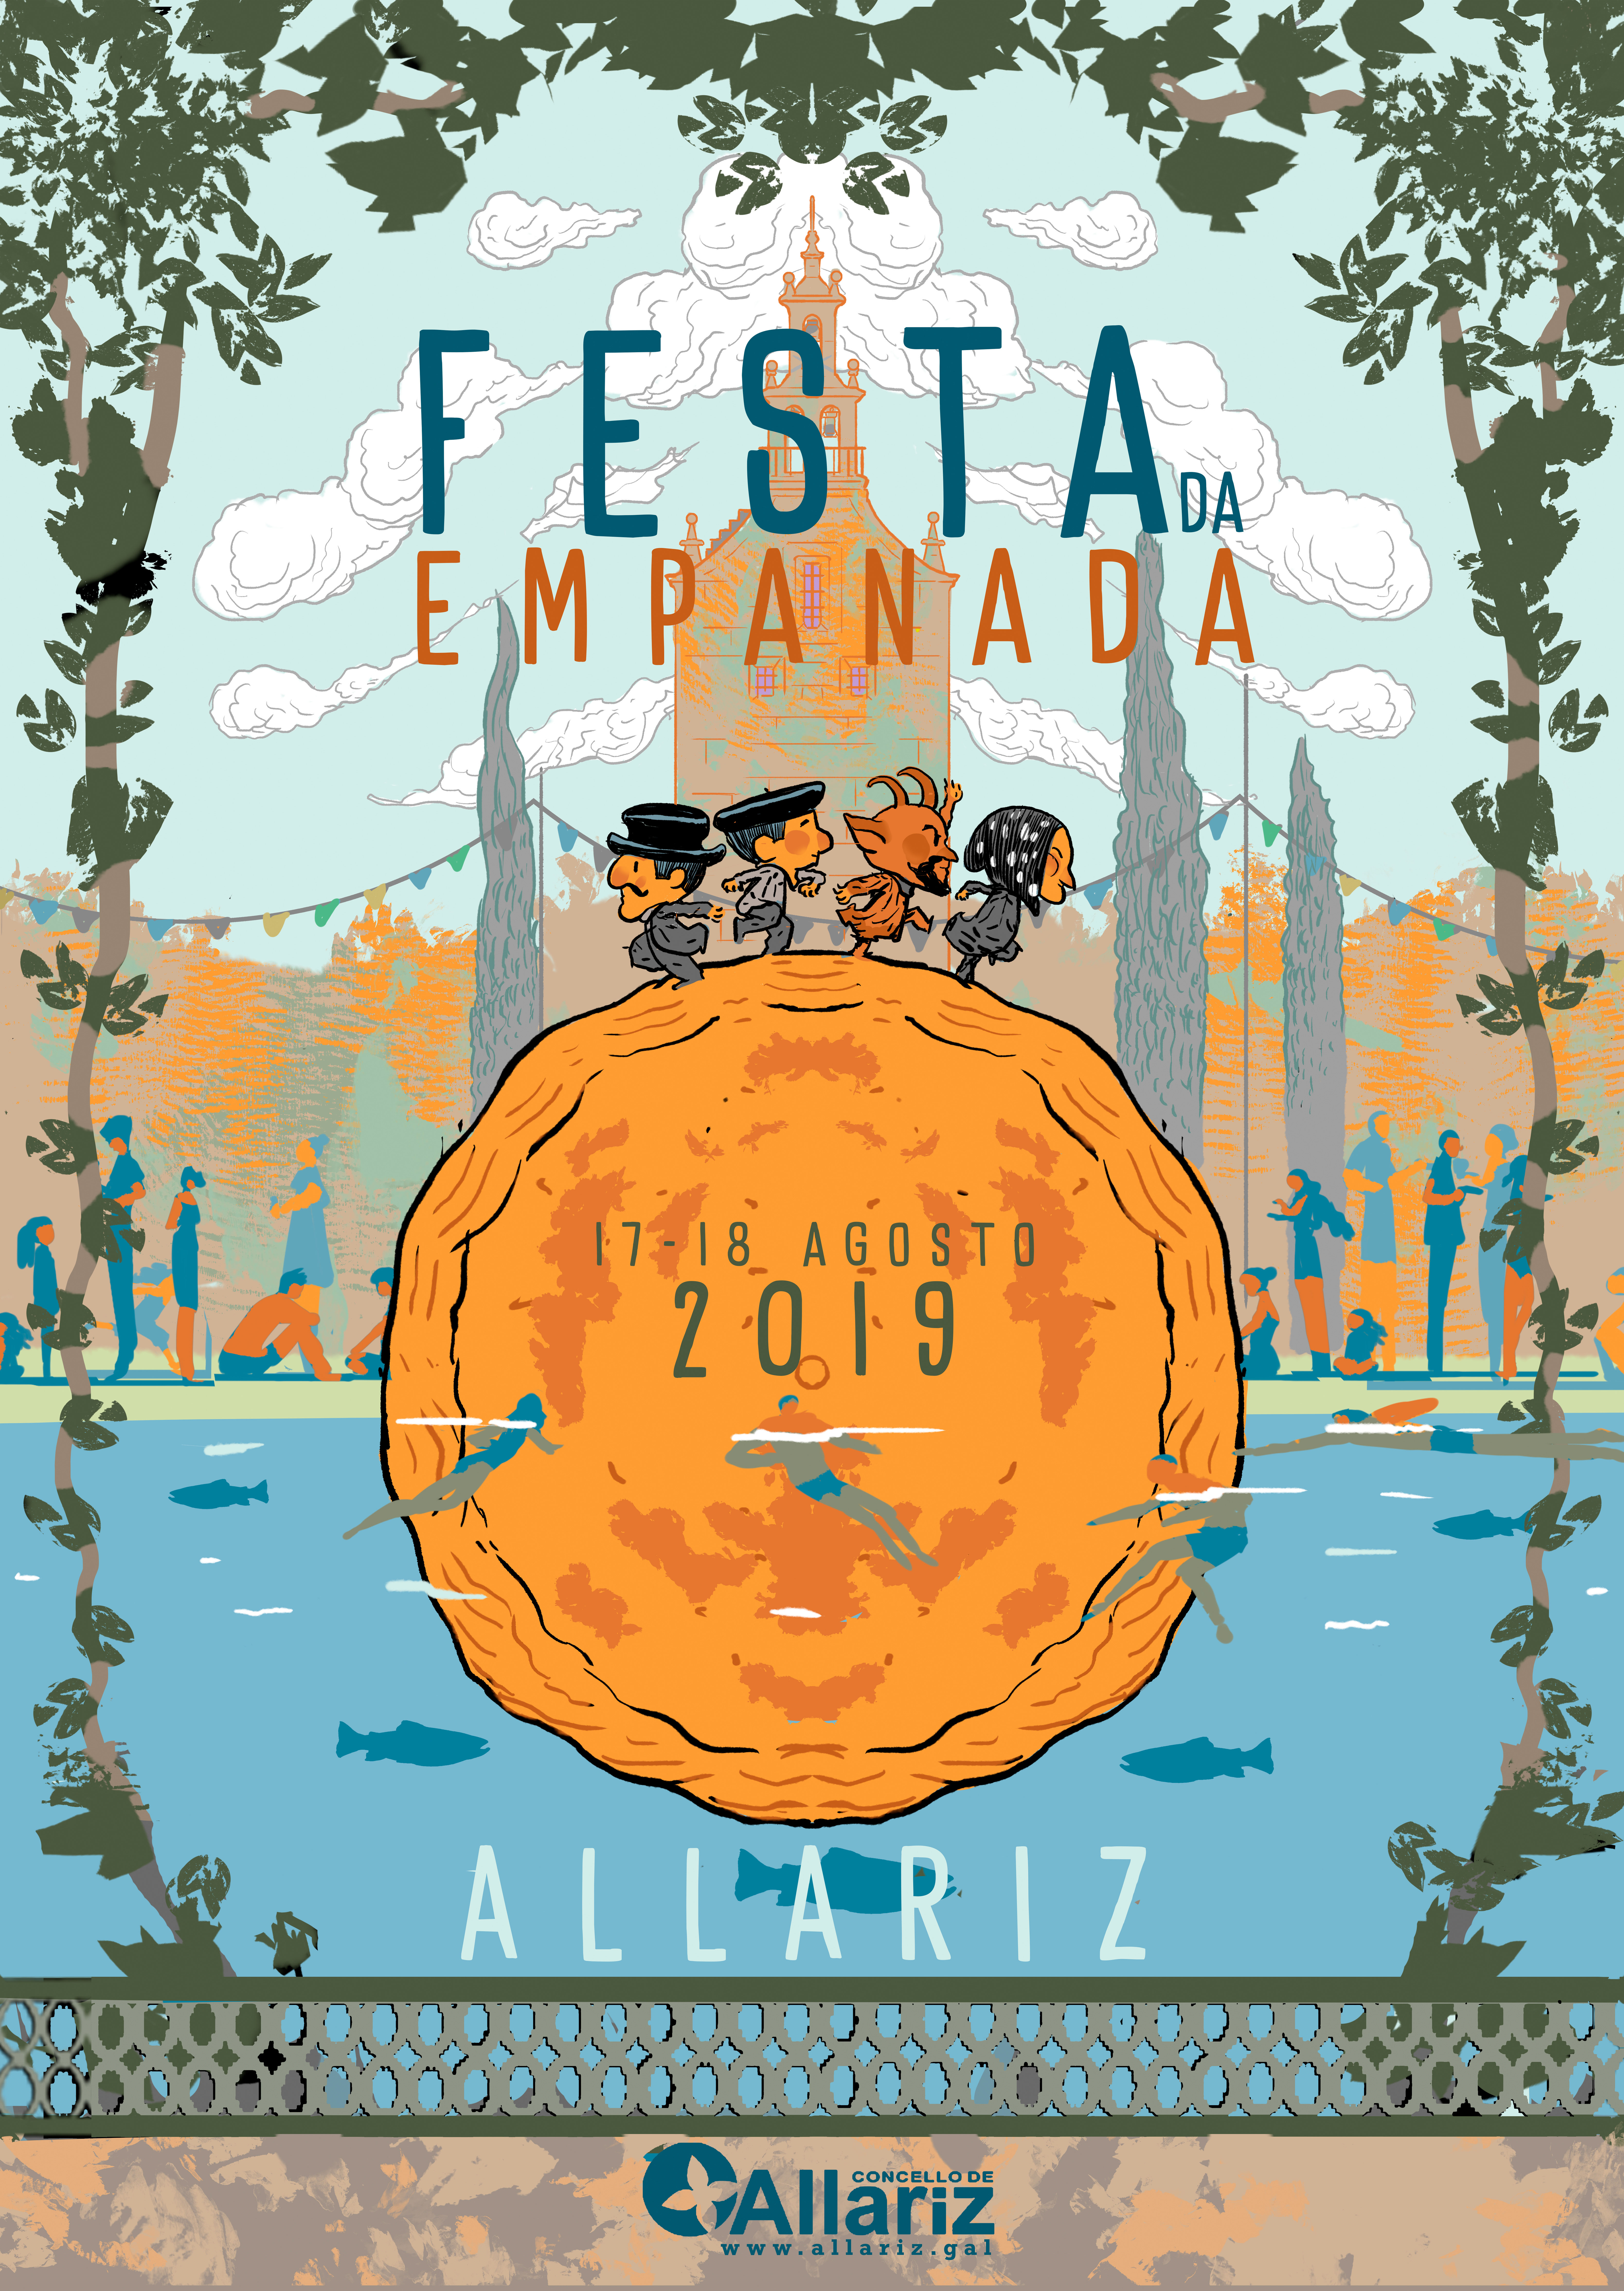 Música, deporte e gastronomía mesturados na Festa da Empanada